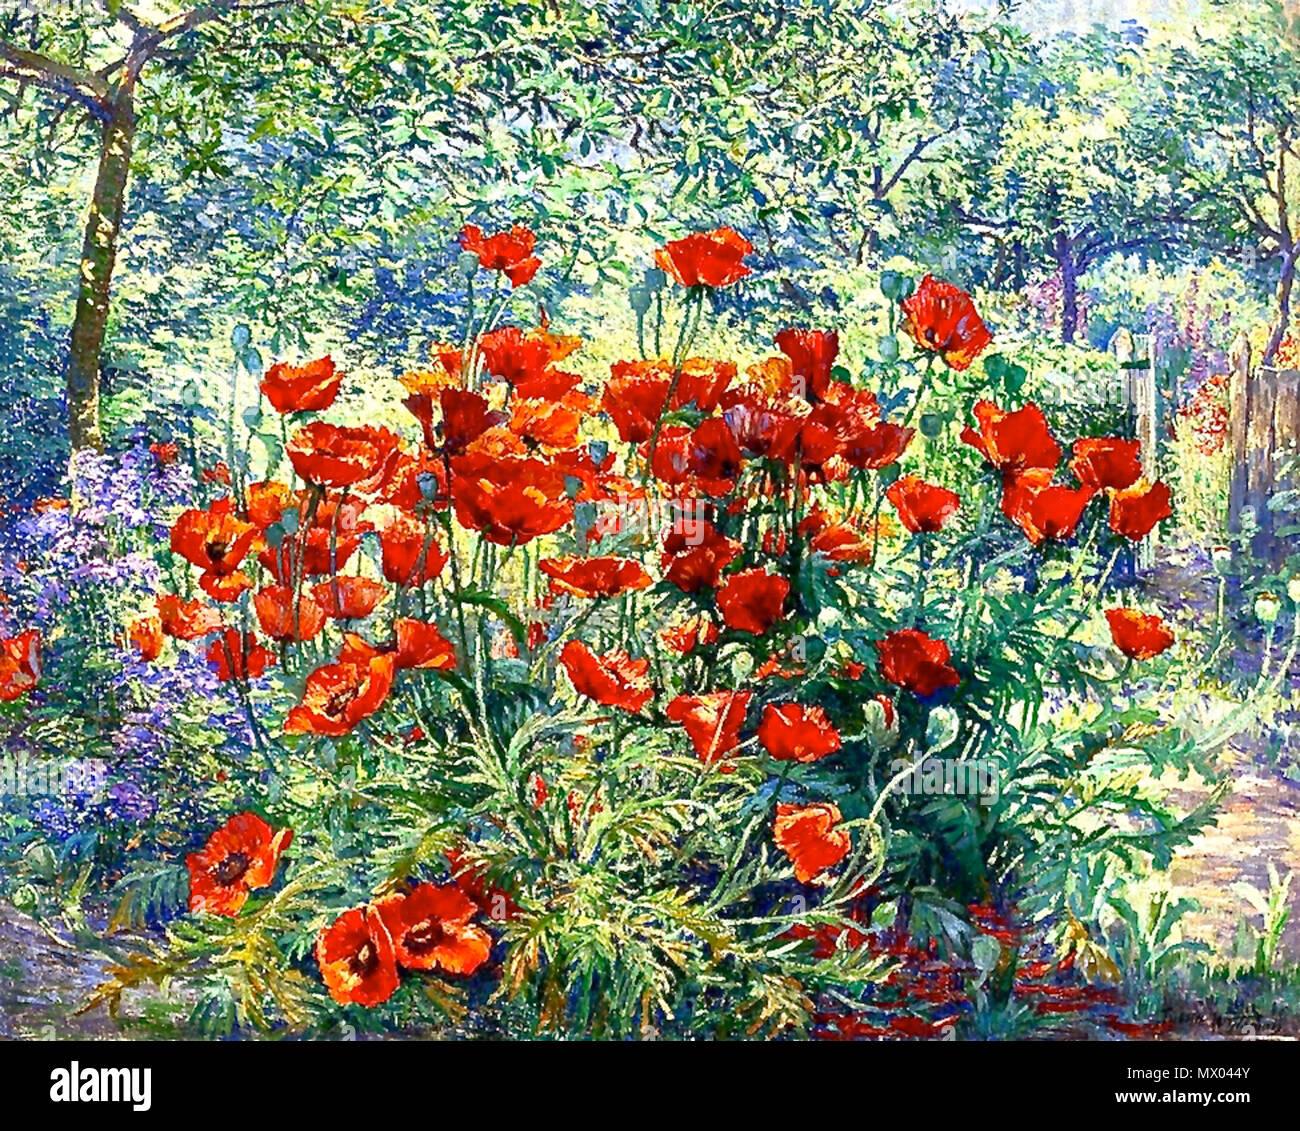 English: Wytsman Juliette: Le Jardin Fleuri (81,3 x 100,3 cm), Öl ...